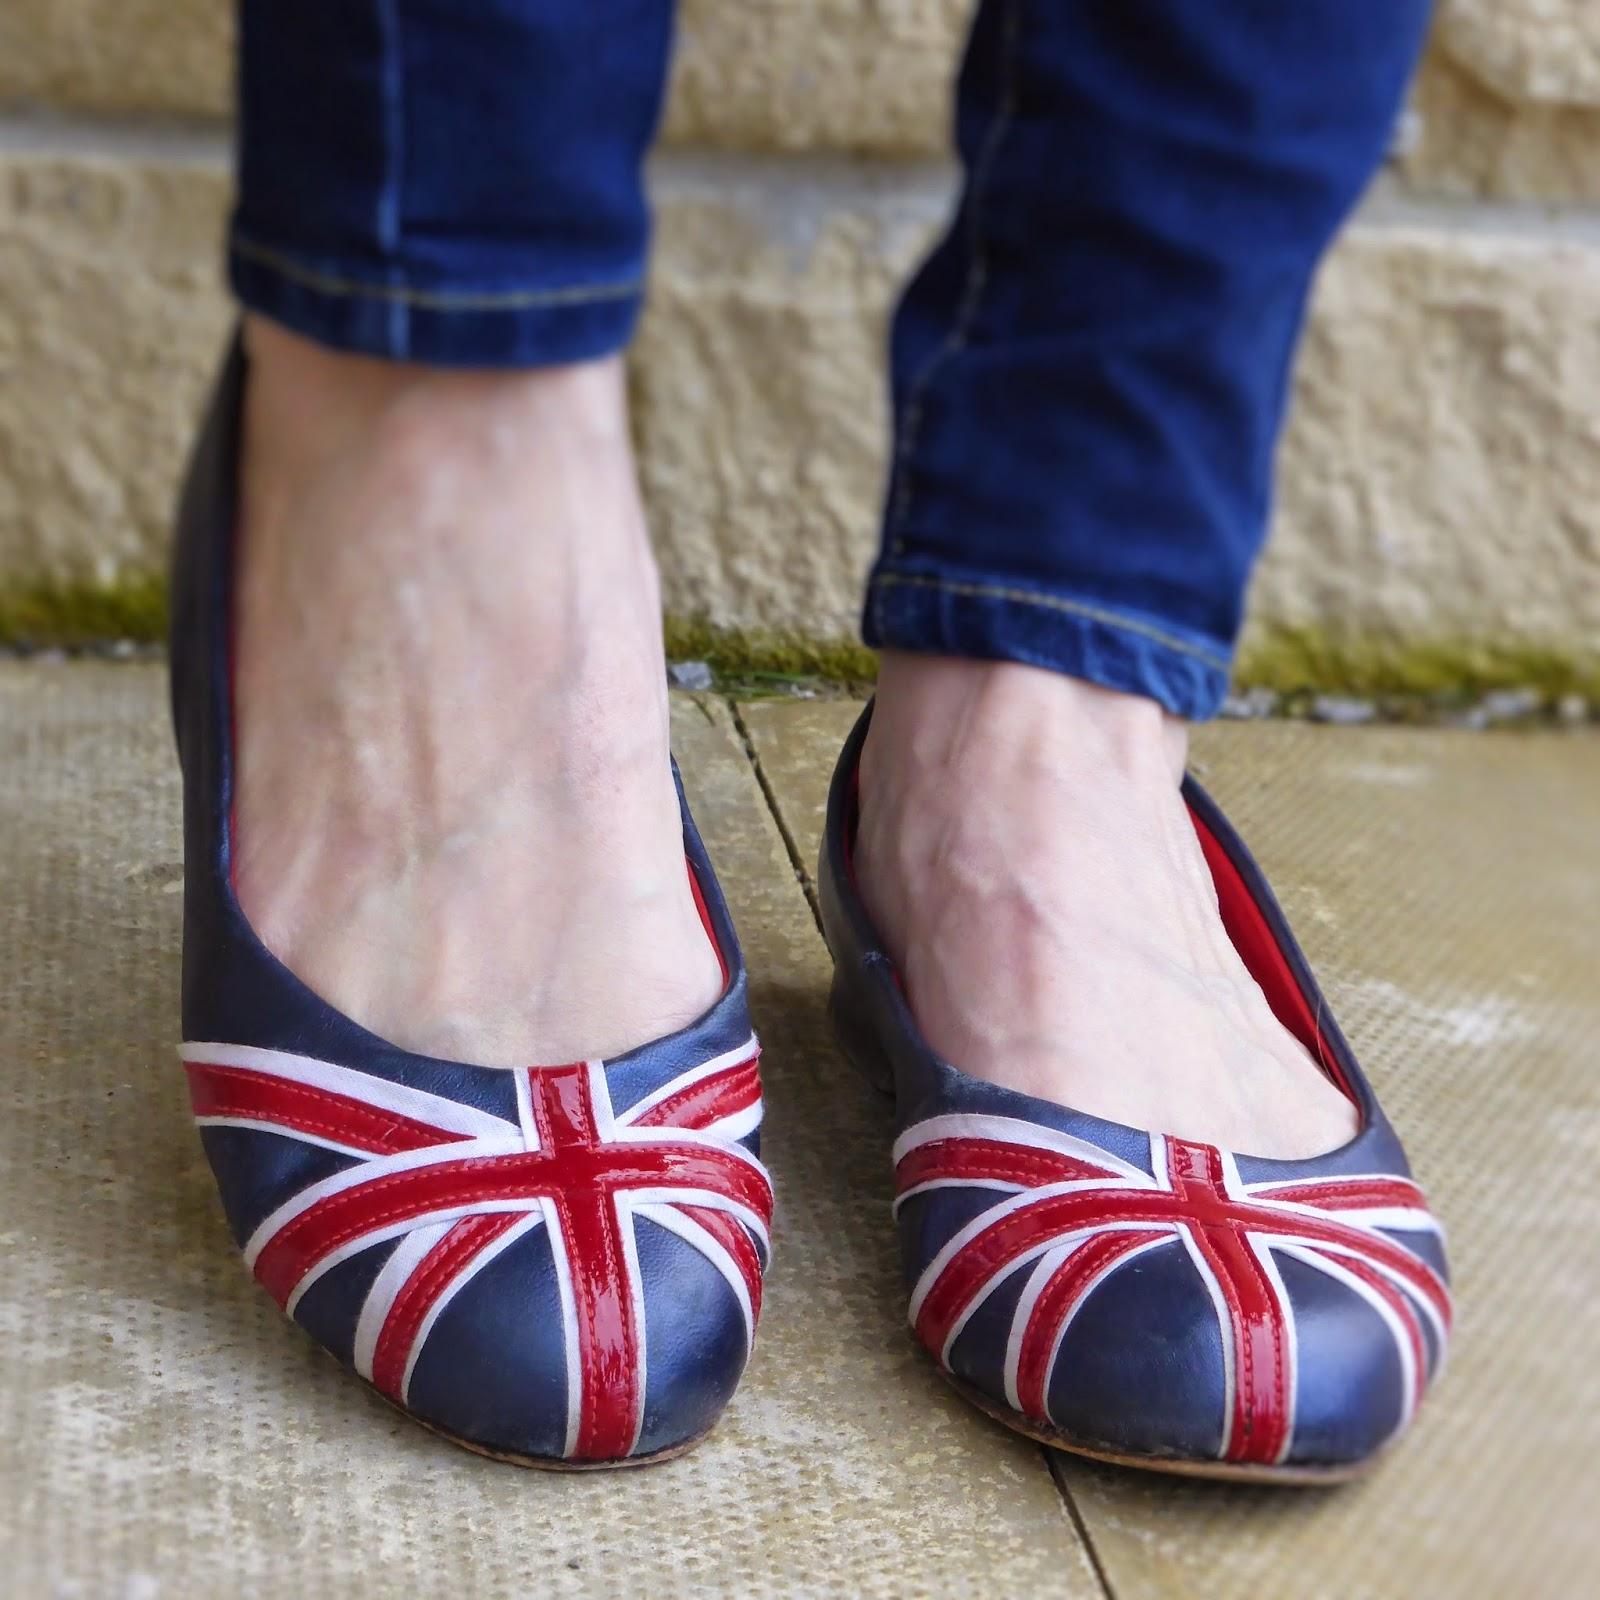 Union flag union jack ballerina shoes from The British Flat Shoe Company.